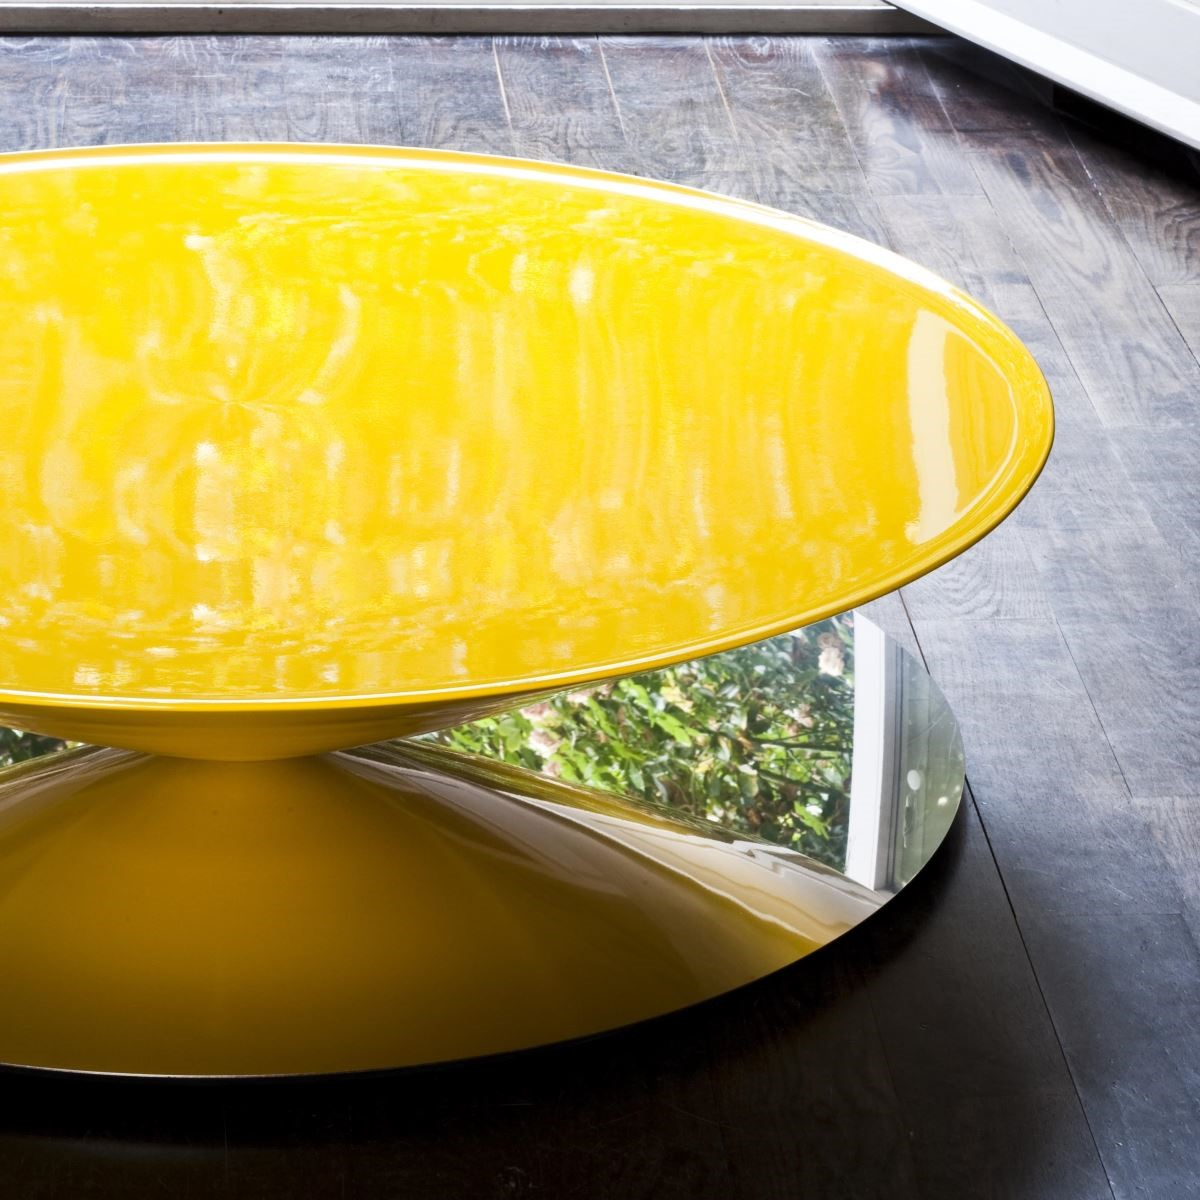 Float。優雅圓弧造型與鏡面相輝映,創造輕盈優美的咖啡桌質感。